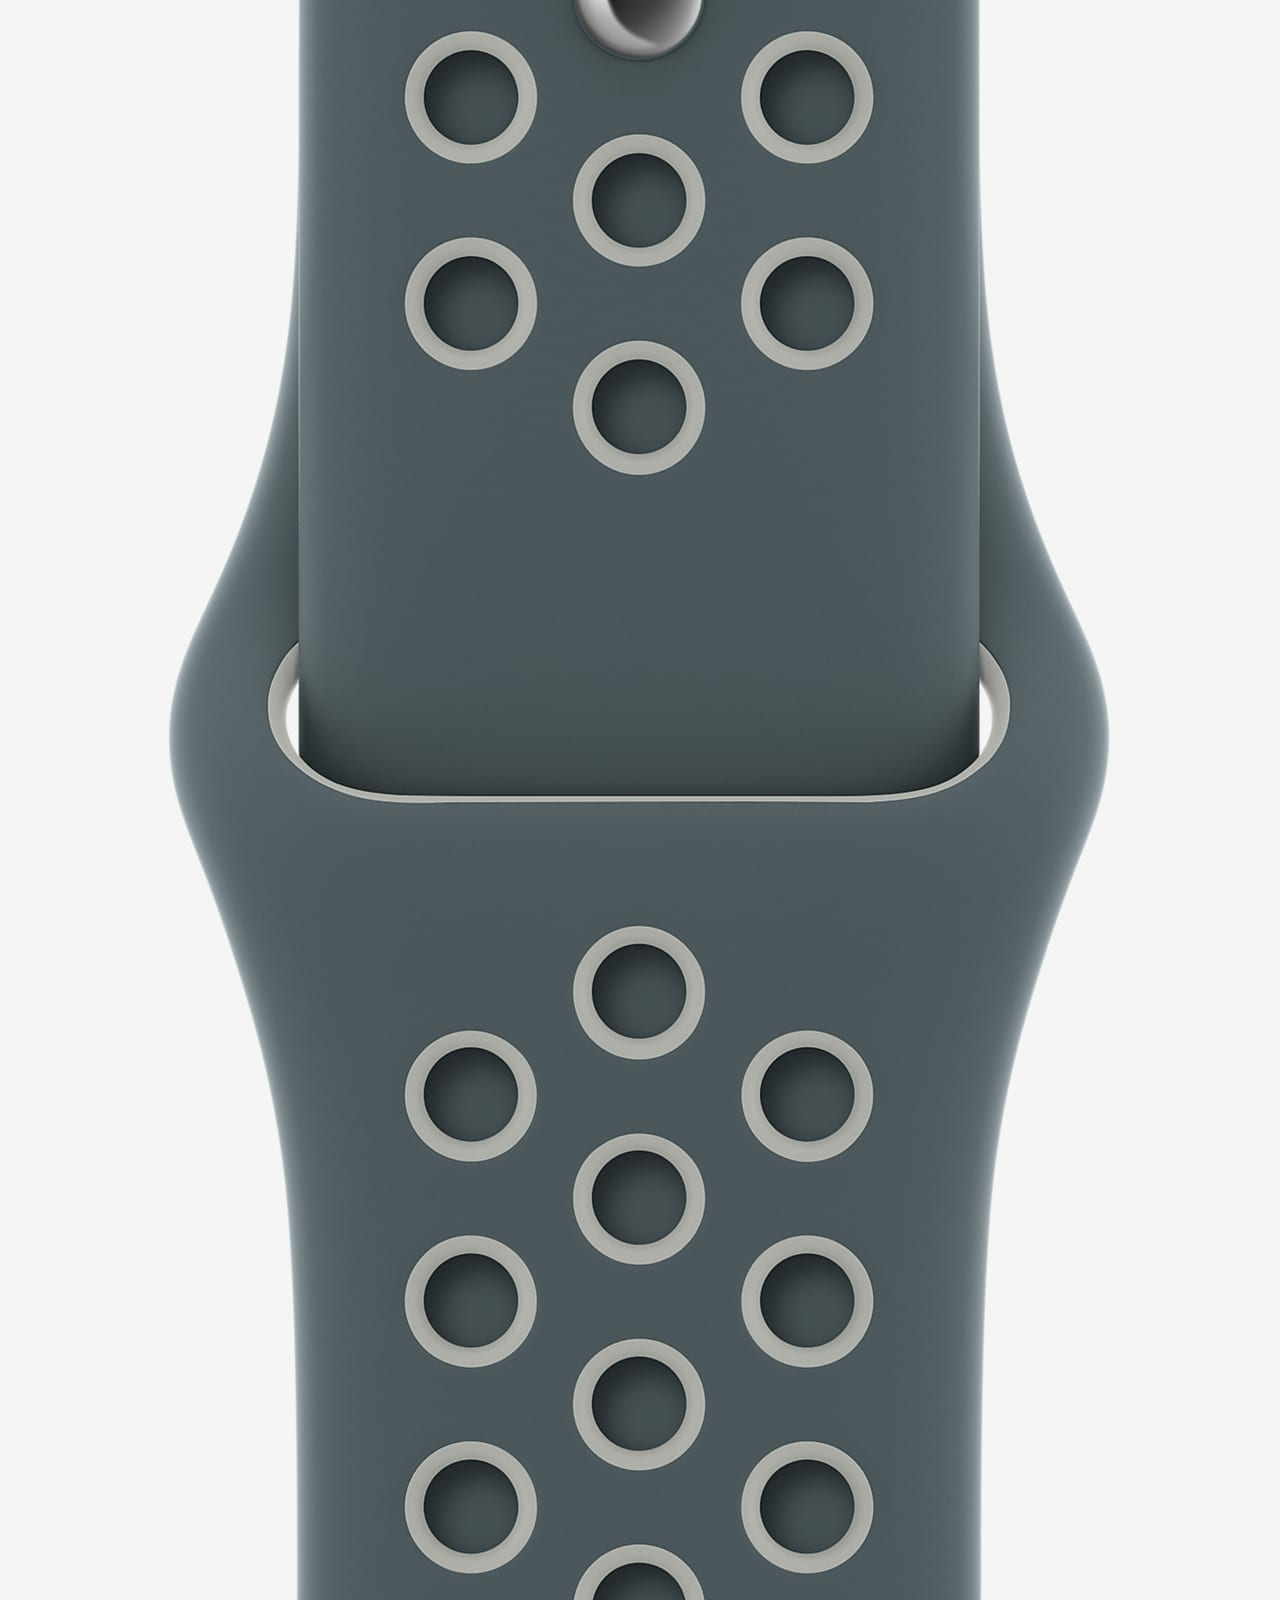 Correa deportiva Nike (regular) de 40 mm Hasta/Plata claro